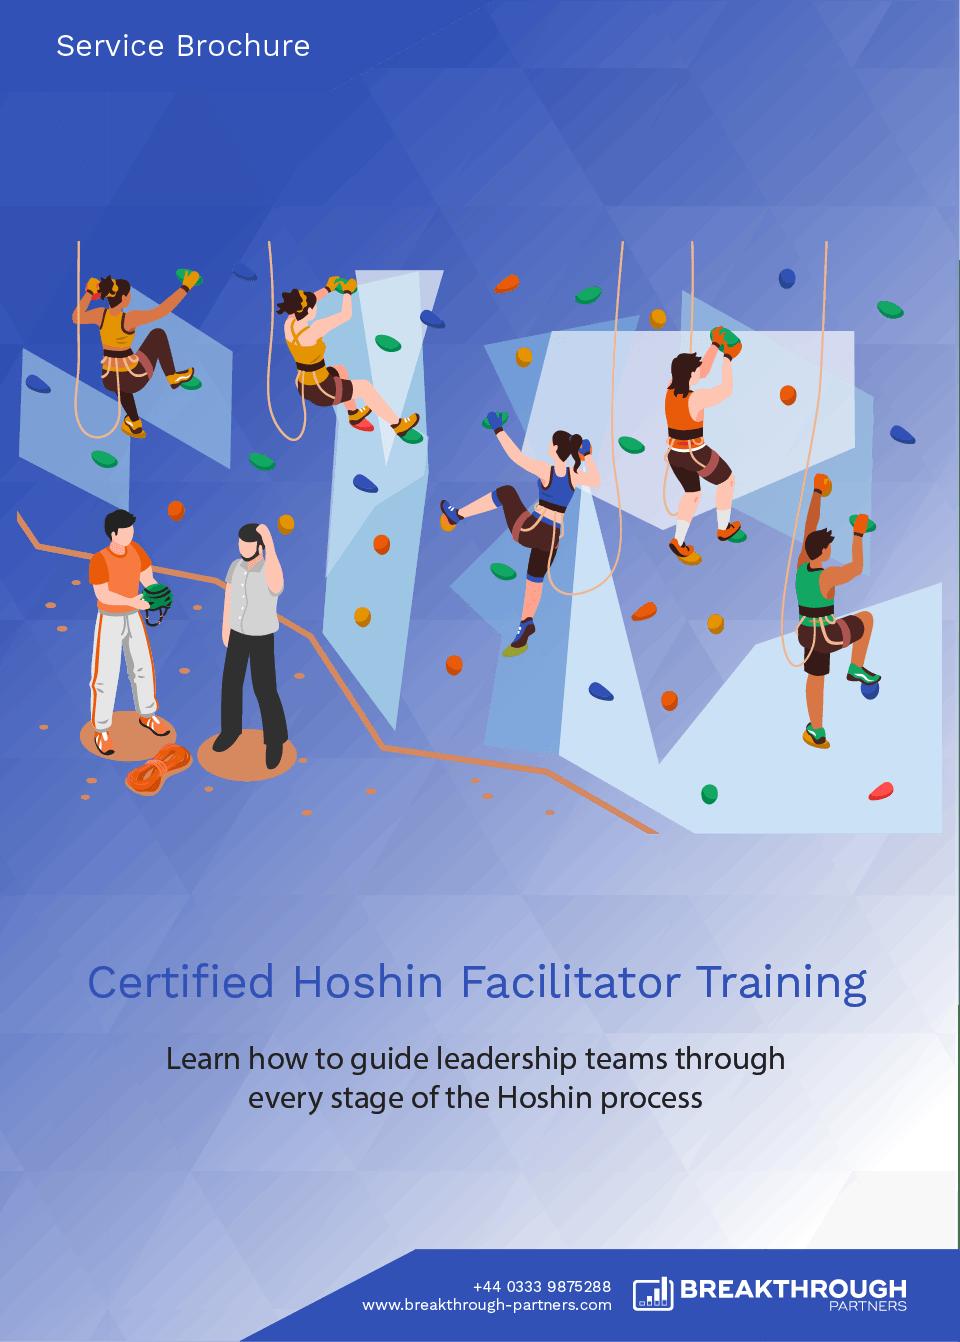 Certified Hoshin Facilitator Training Brochure